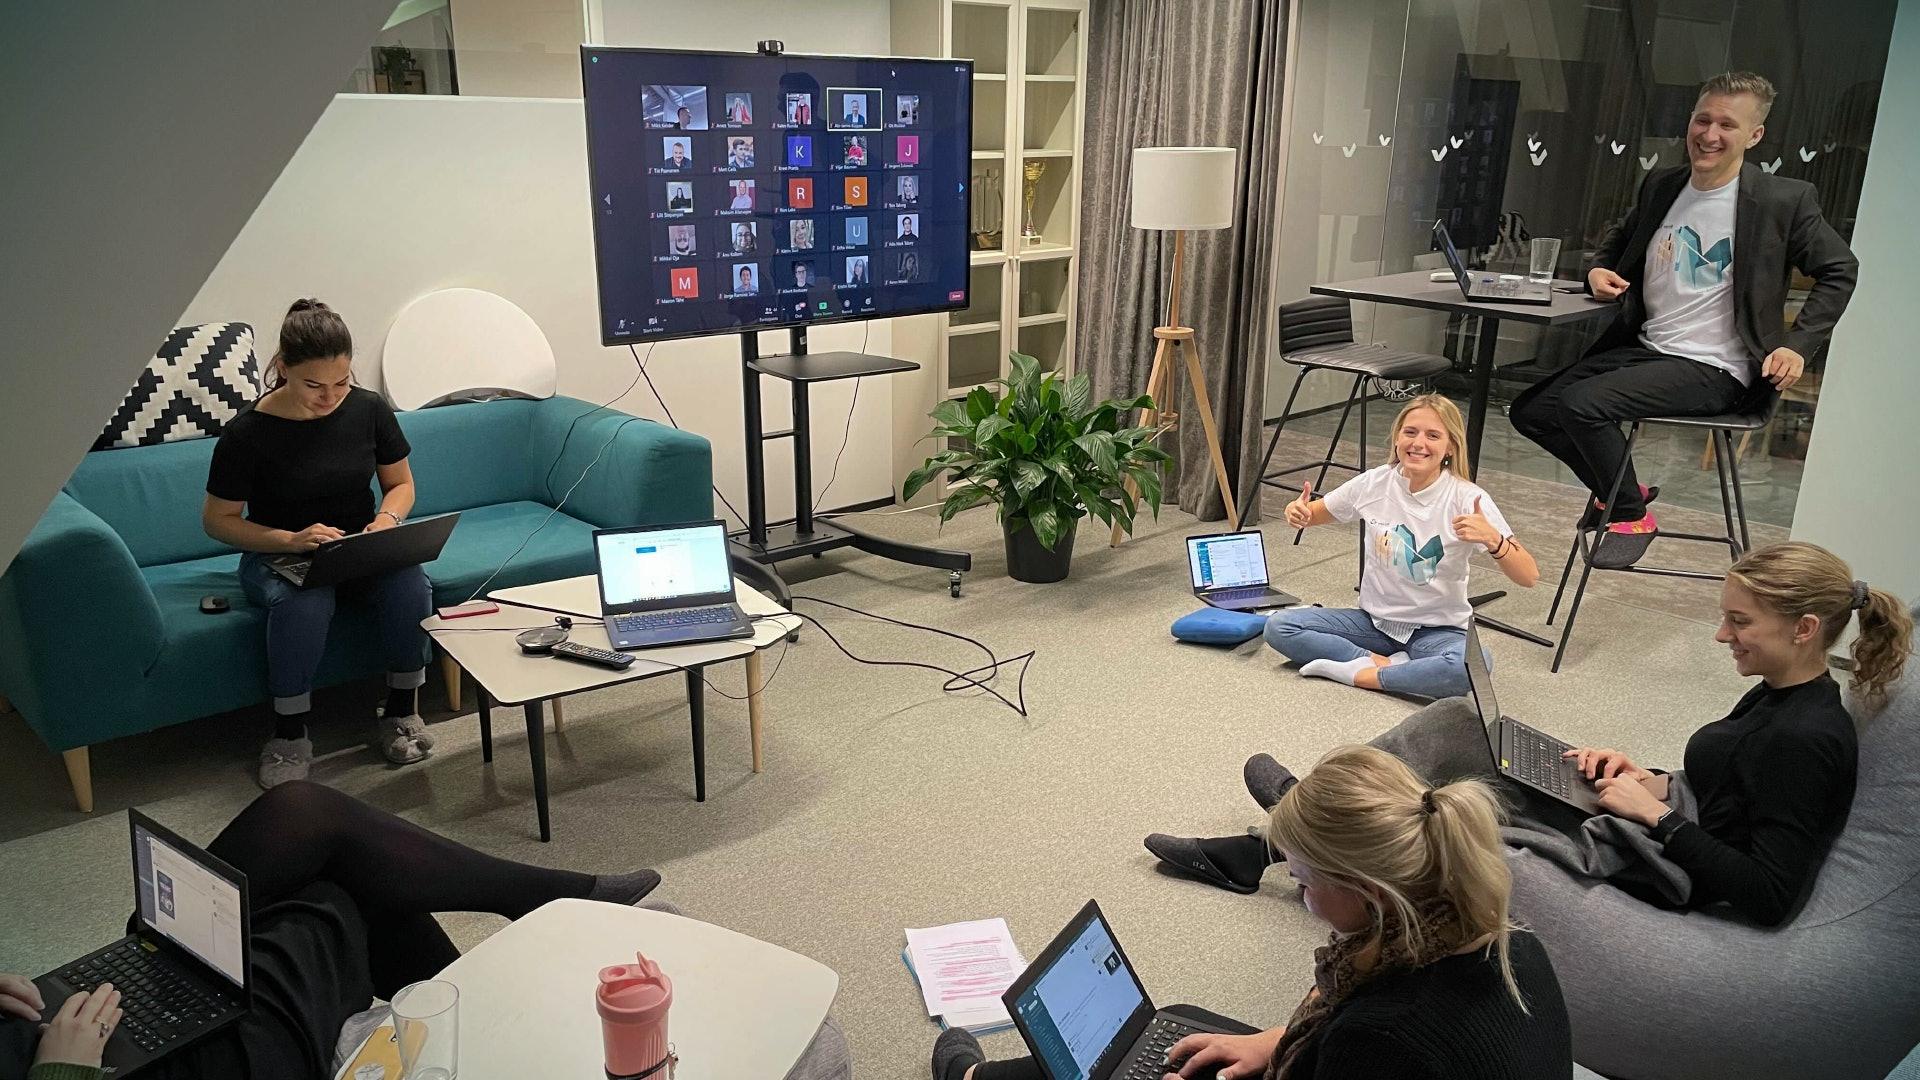 Mikk's team, working hard on creating The Waiting Game